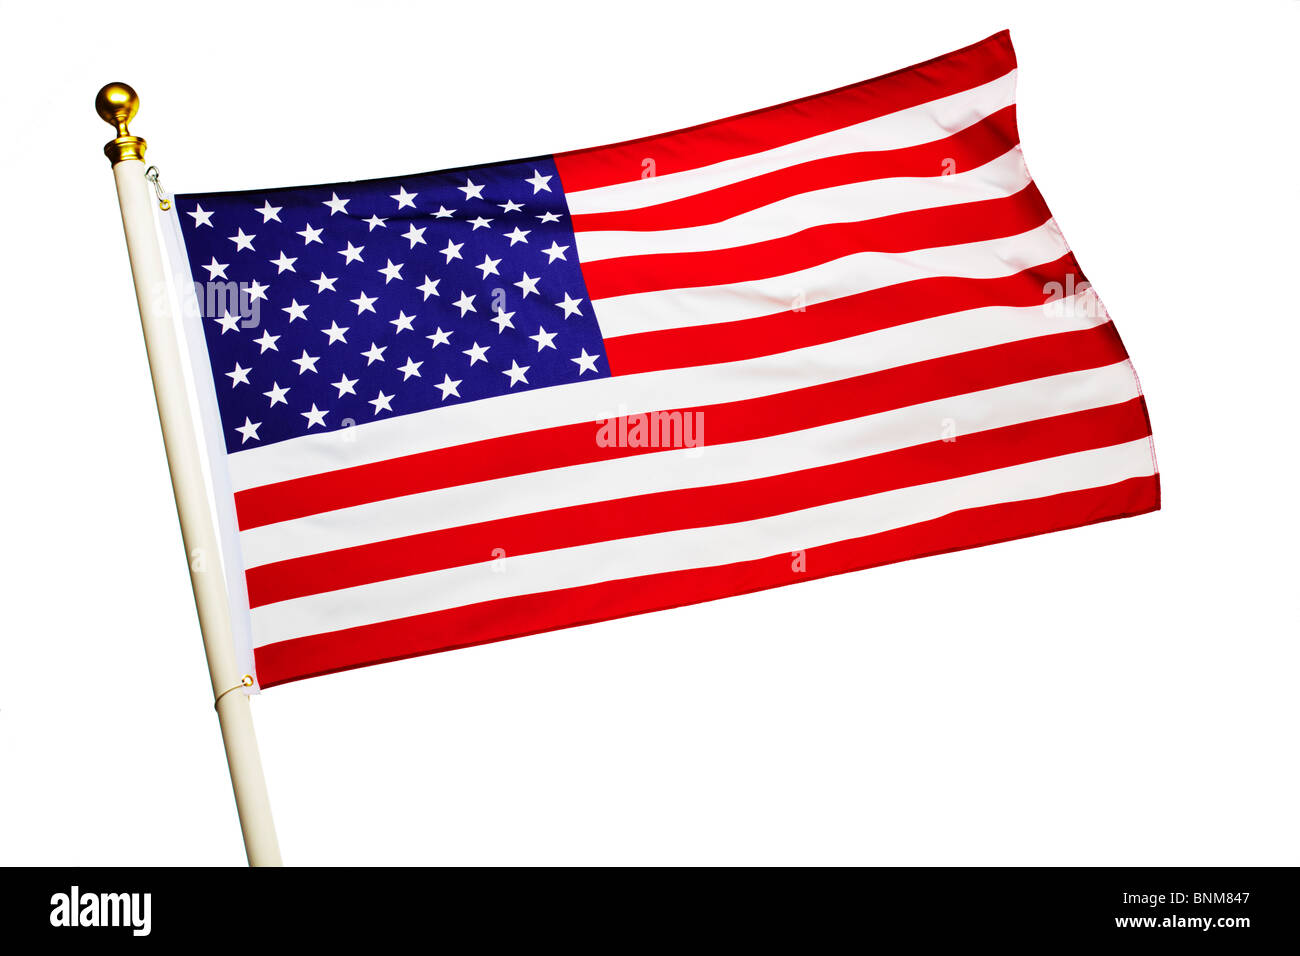 American Flag Flying - Stock Image